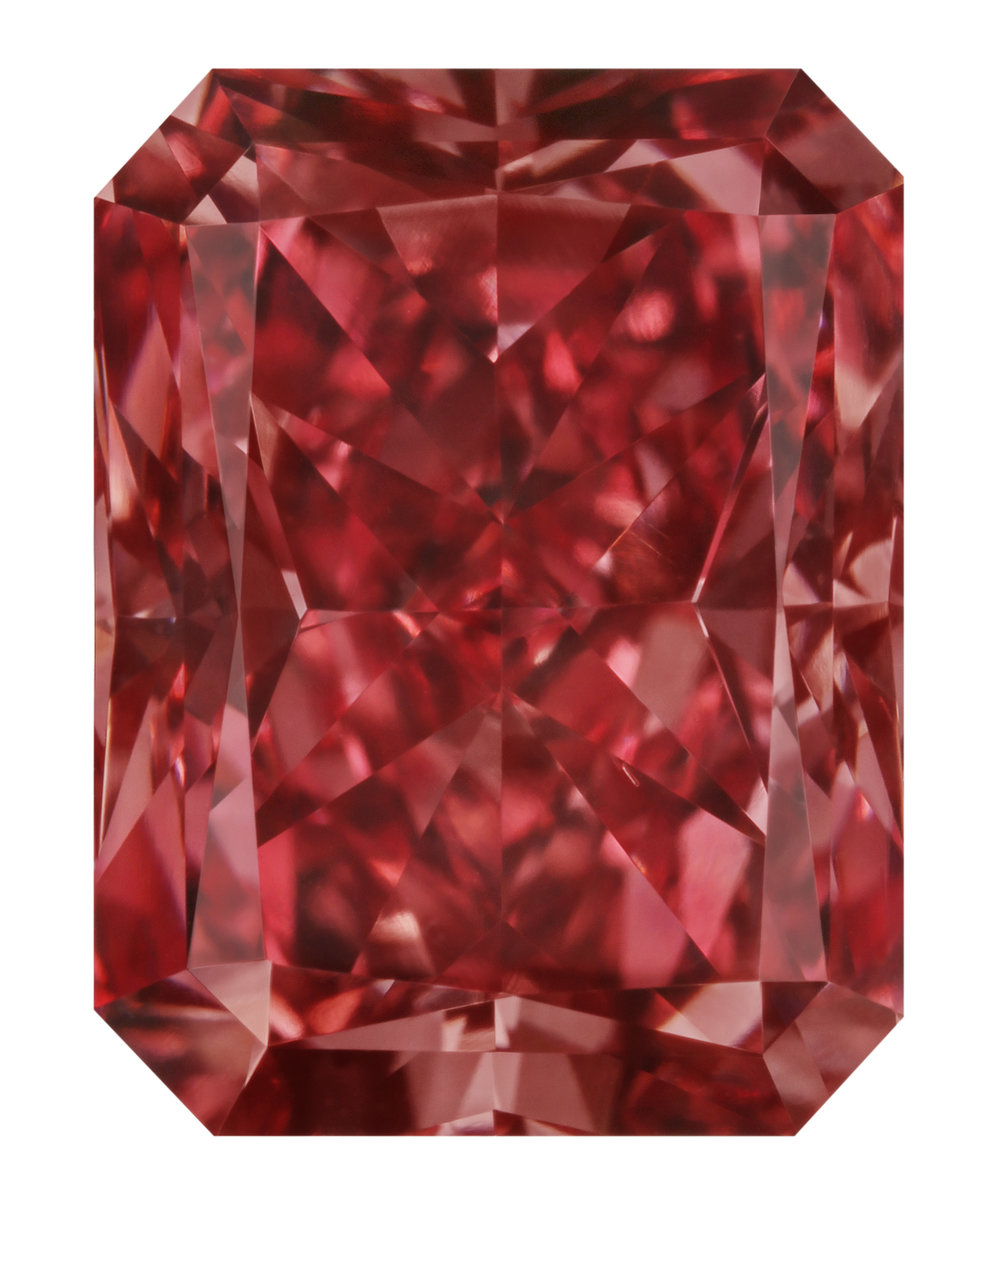 The Argyle Everglow™, a 2.11 carat polished radiant cut Fancy Red diamond. PHOTO: Copyright © 2017 Argyle Diamonds Limited